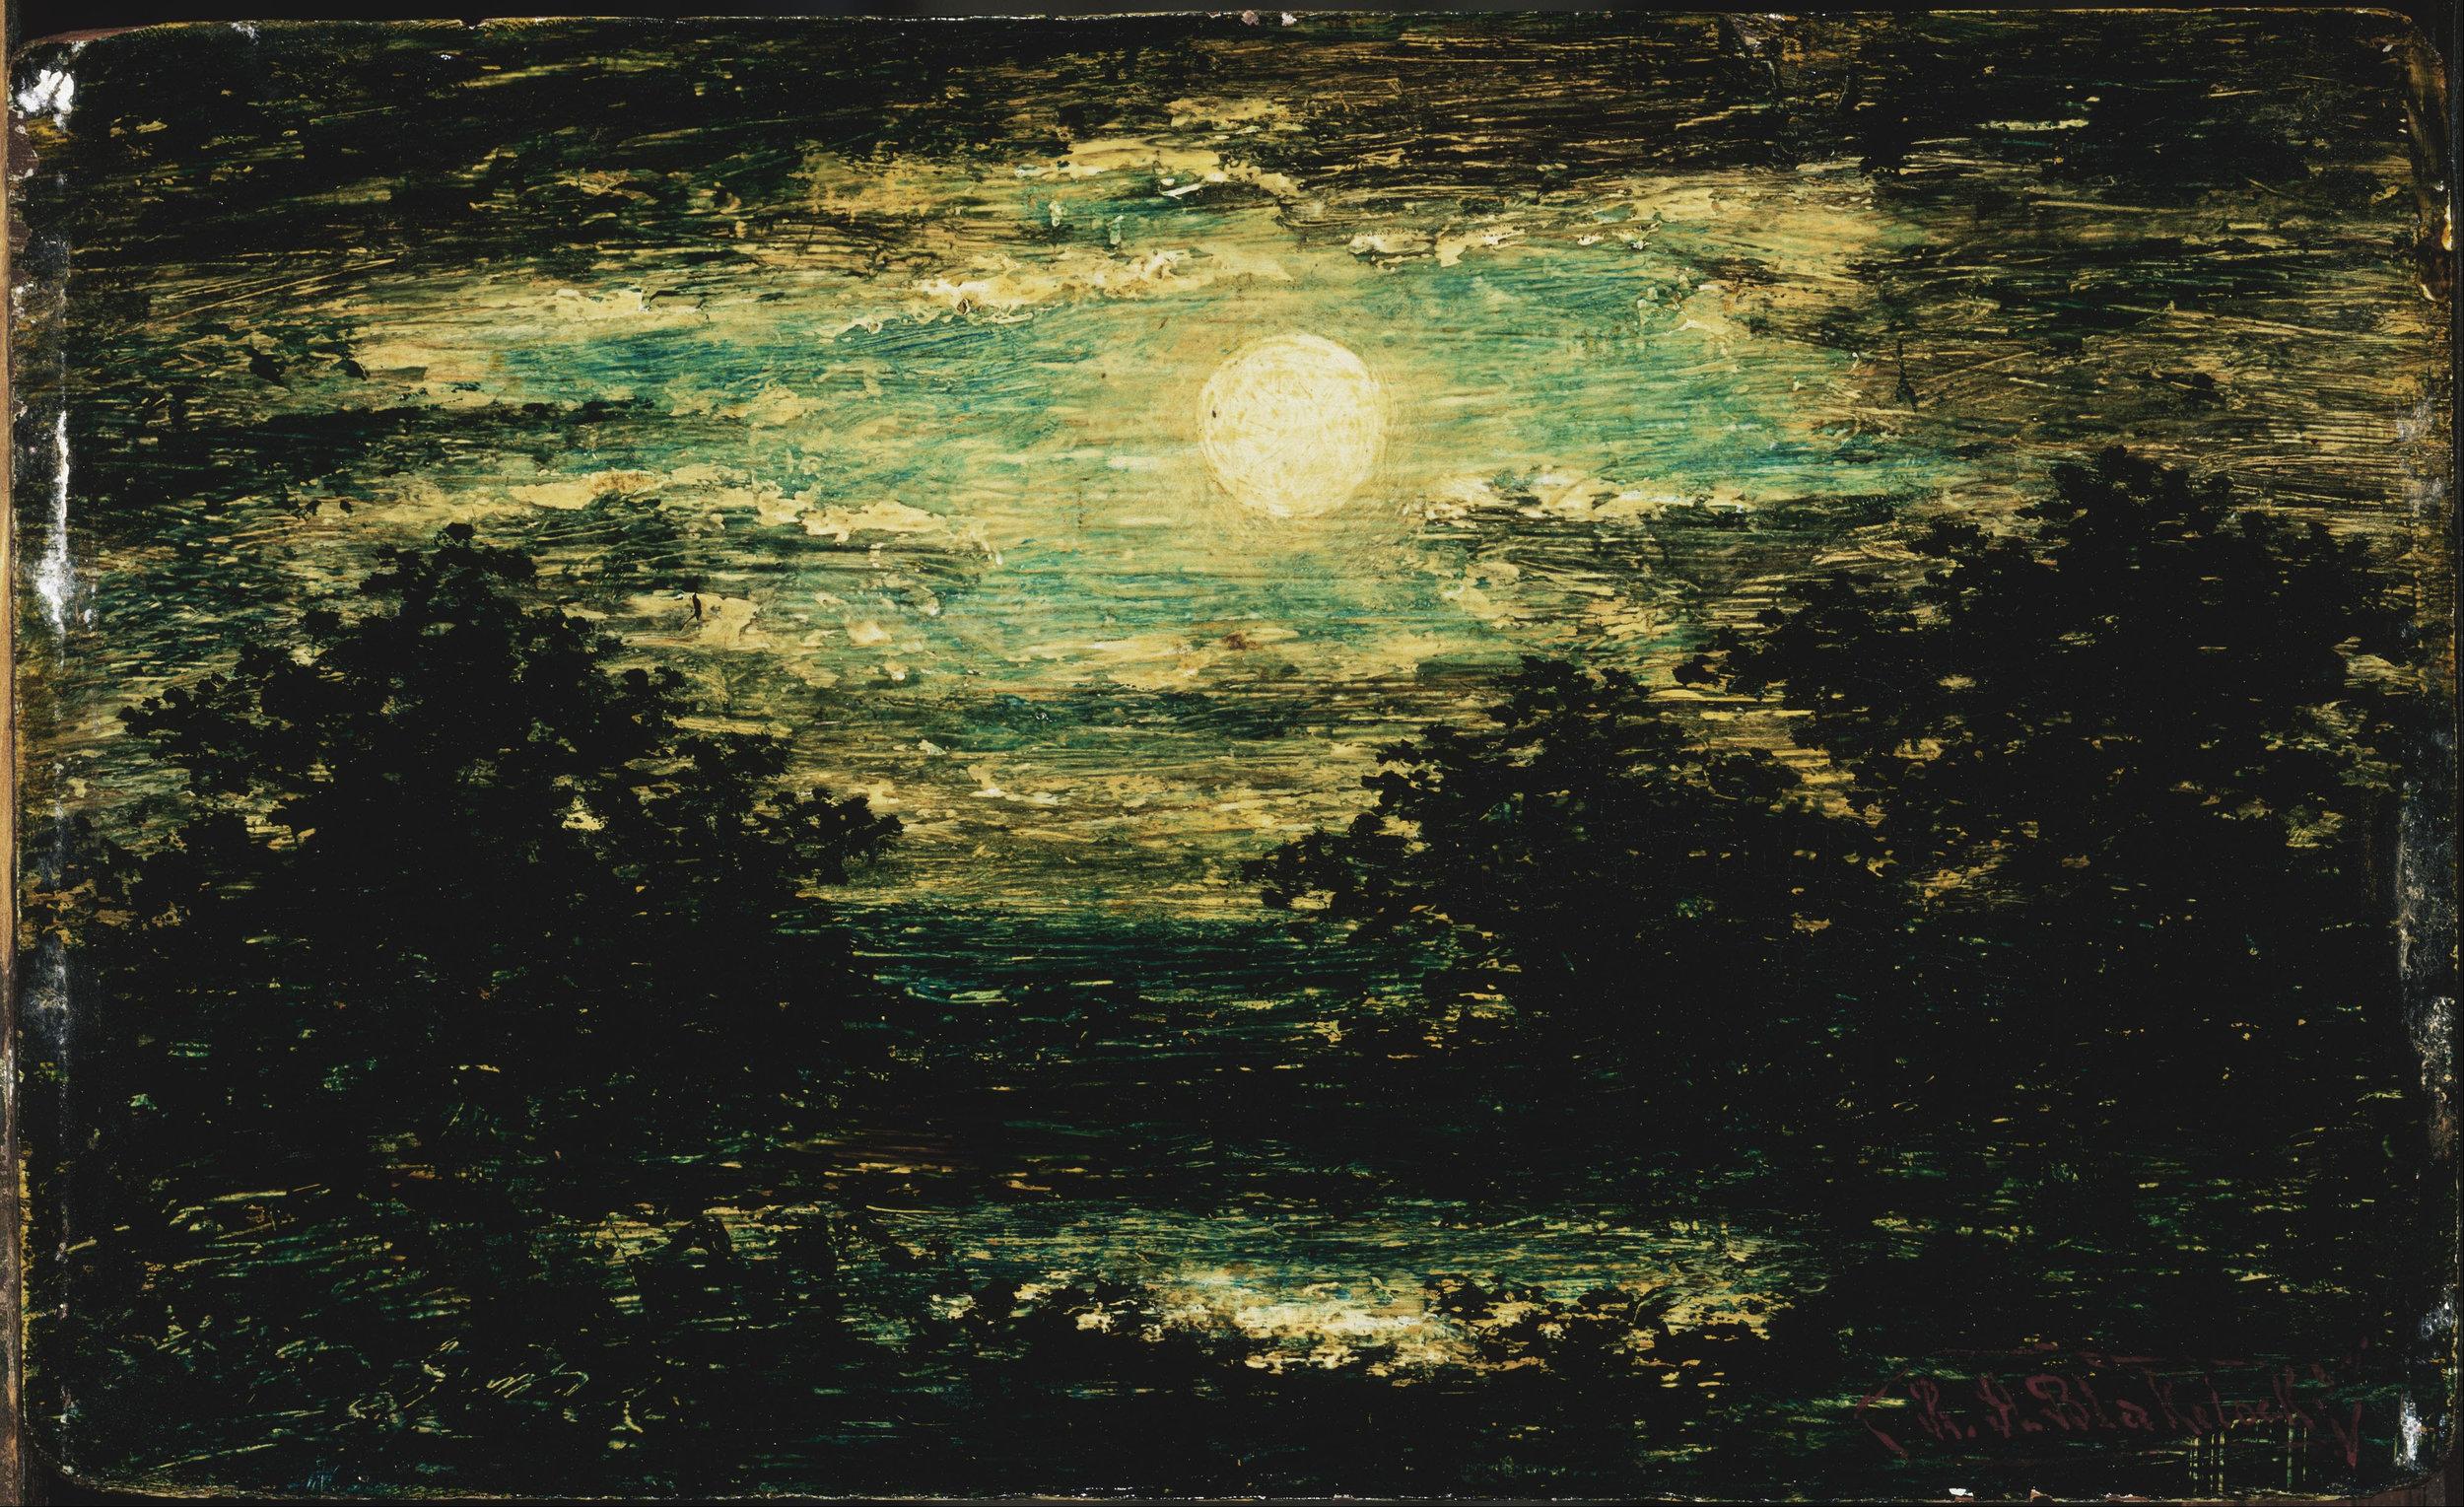 Blakelock, Ralph Albert. Moonlight . 1886. Corcoran Gallery of Art, Washington, DC.